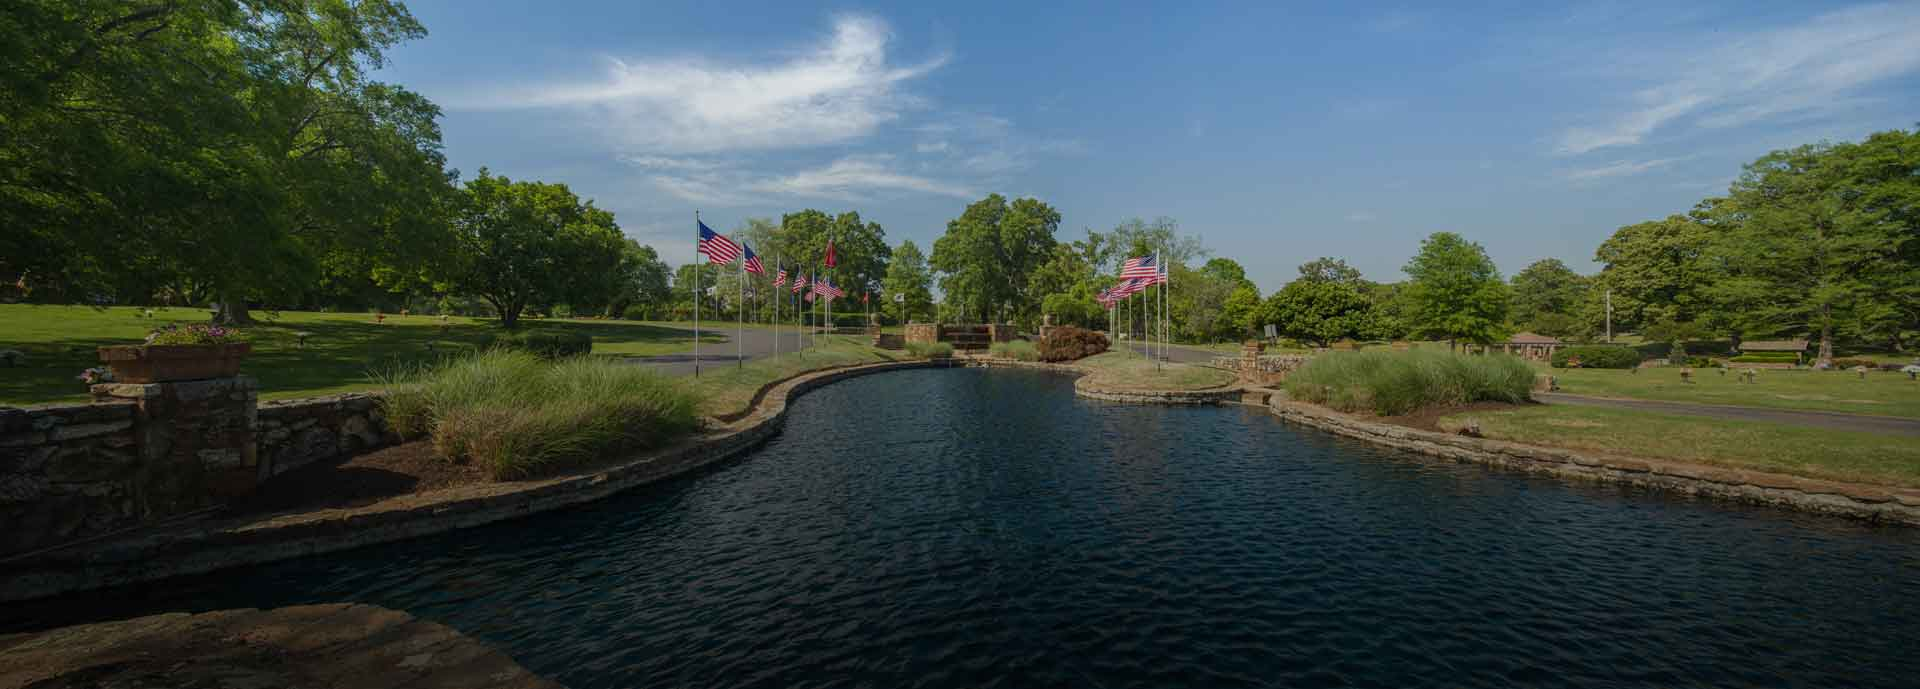 Memorial Park Funeral Home & Cemetery - Memphis, TN